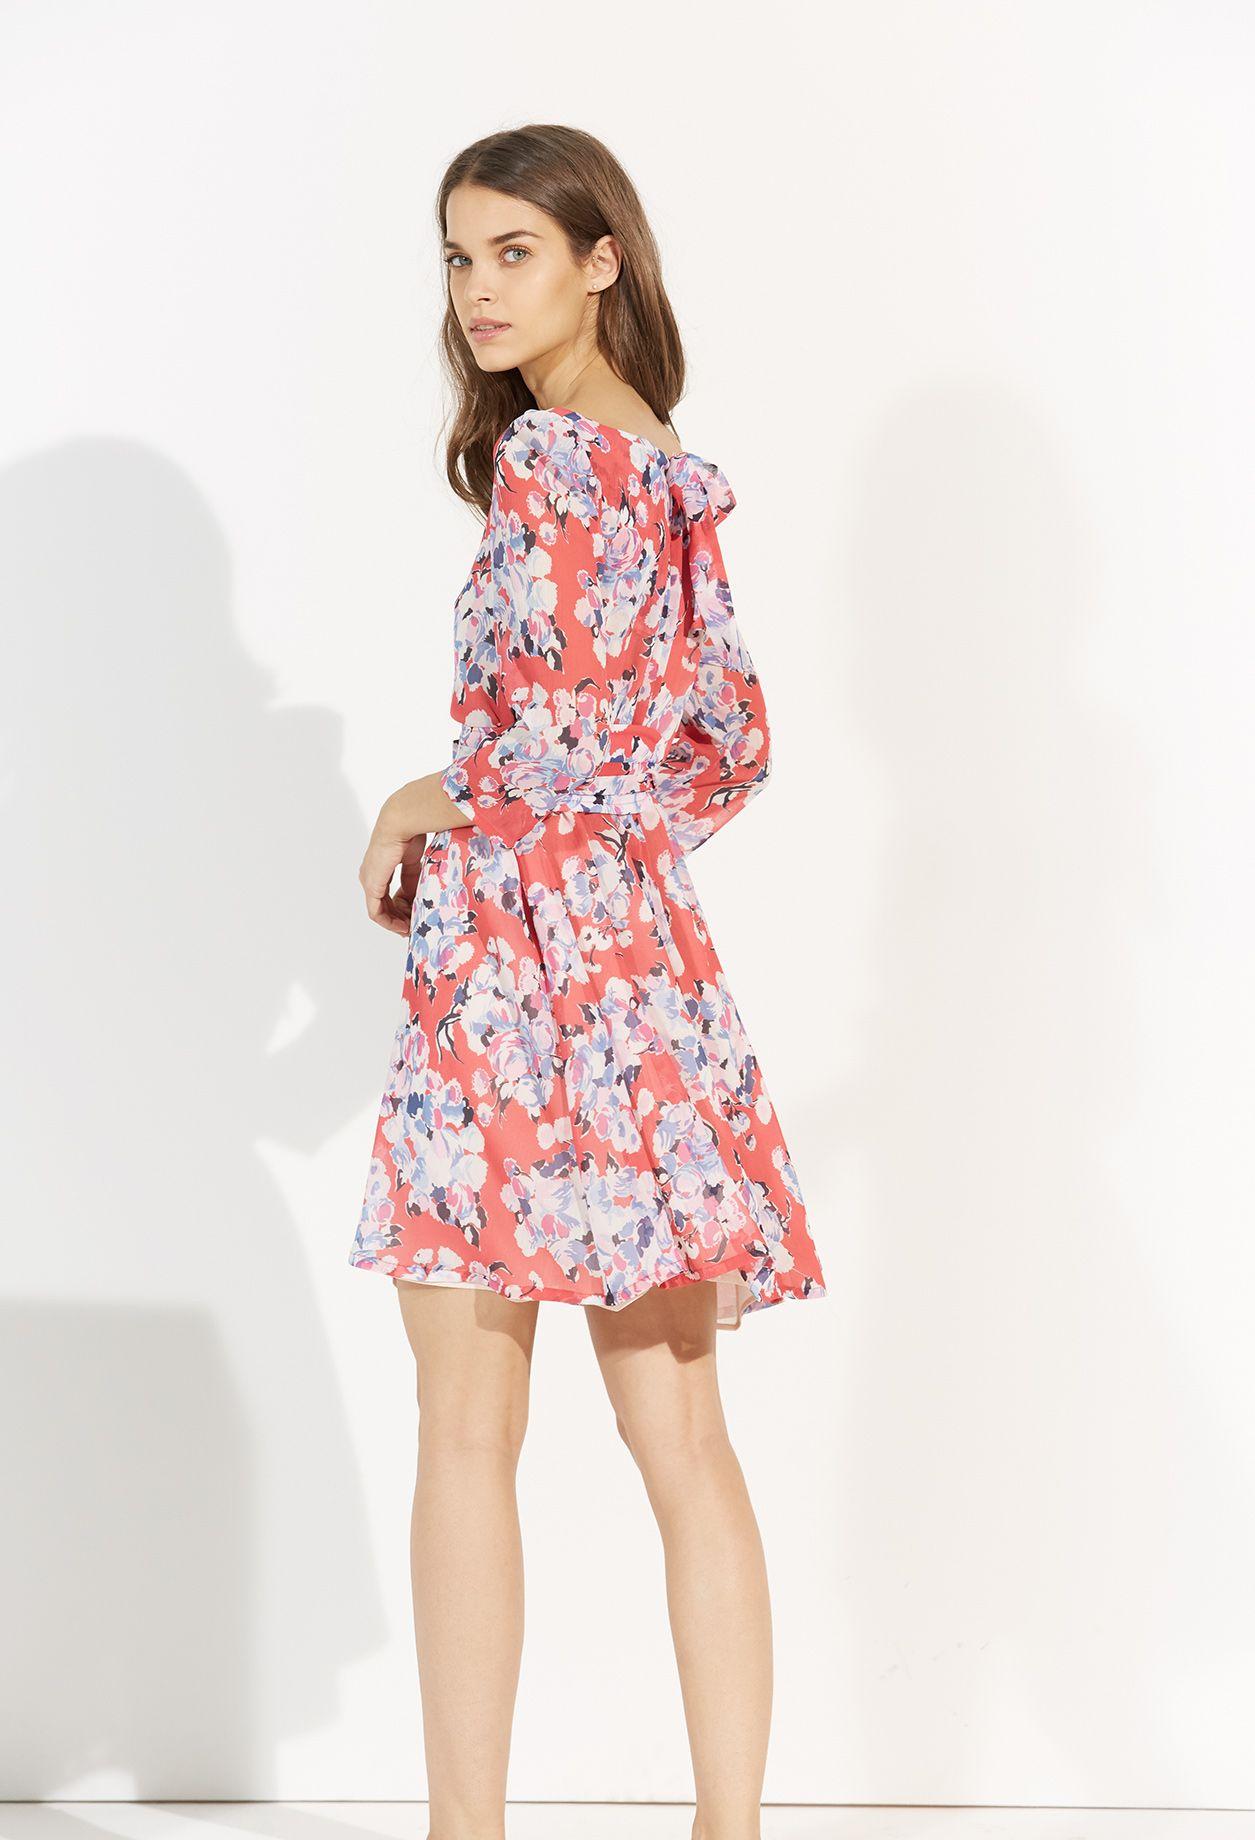 RIFIFI LOVE 2 - Claudie Pierlot | My Style - Dresses | Pinterest ...